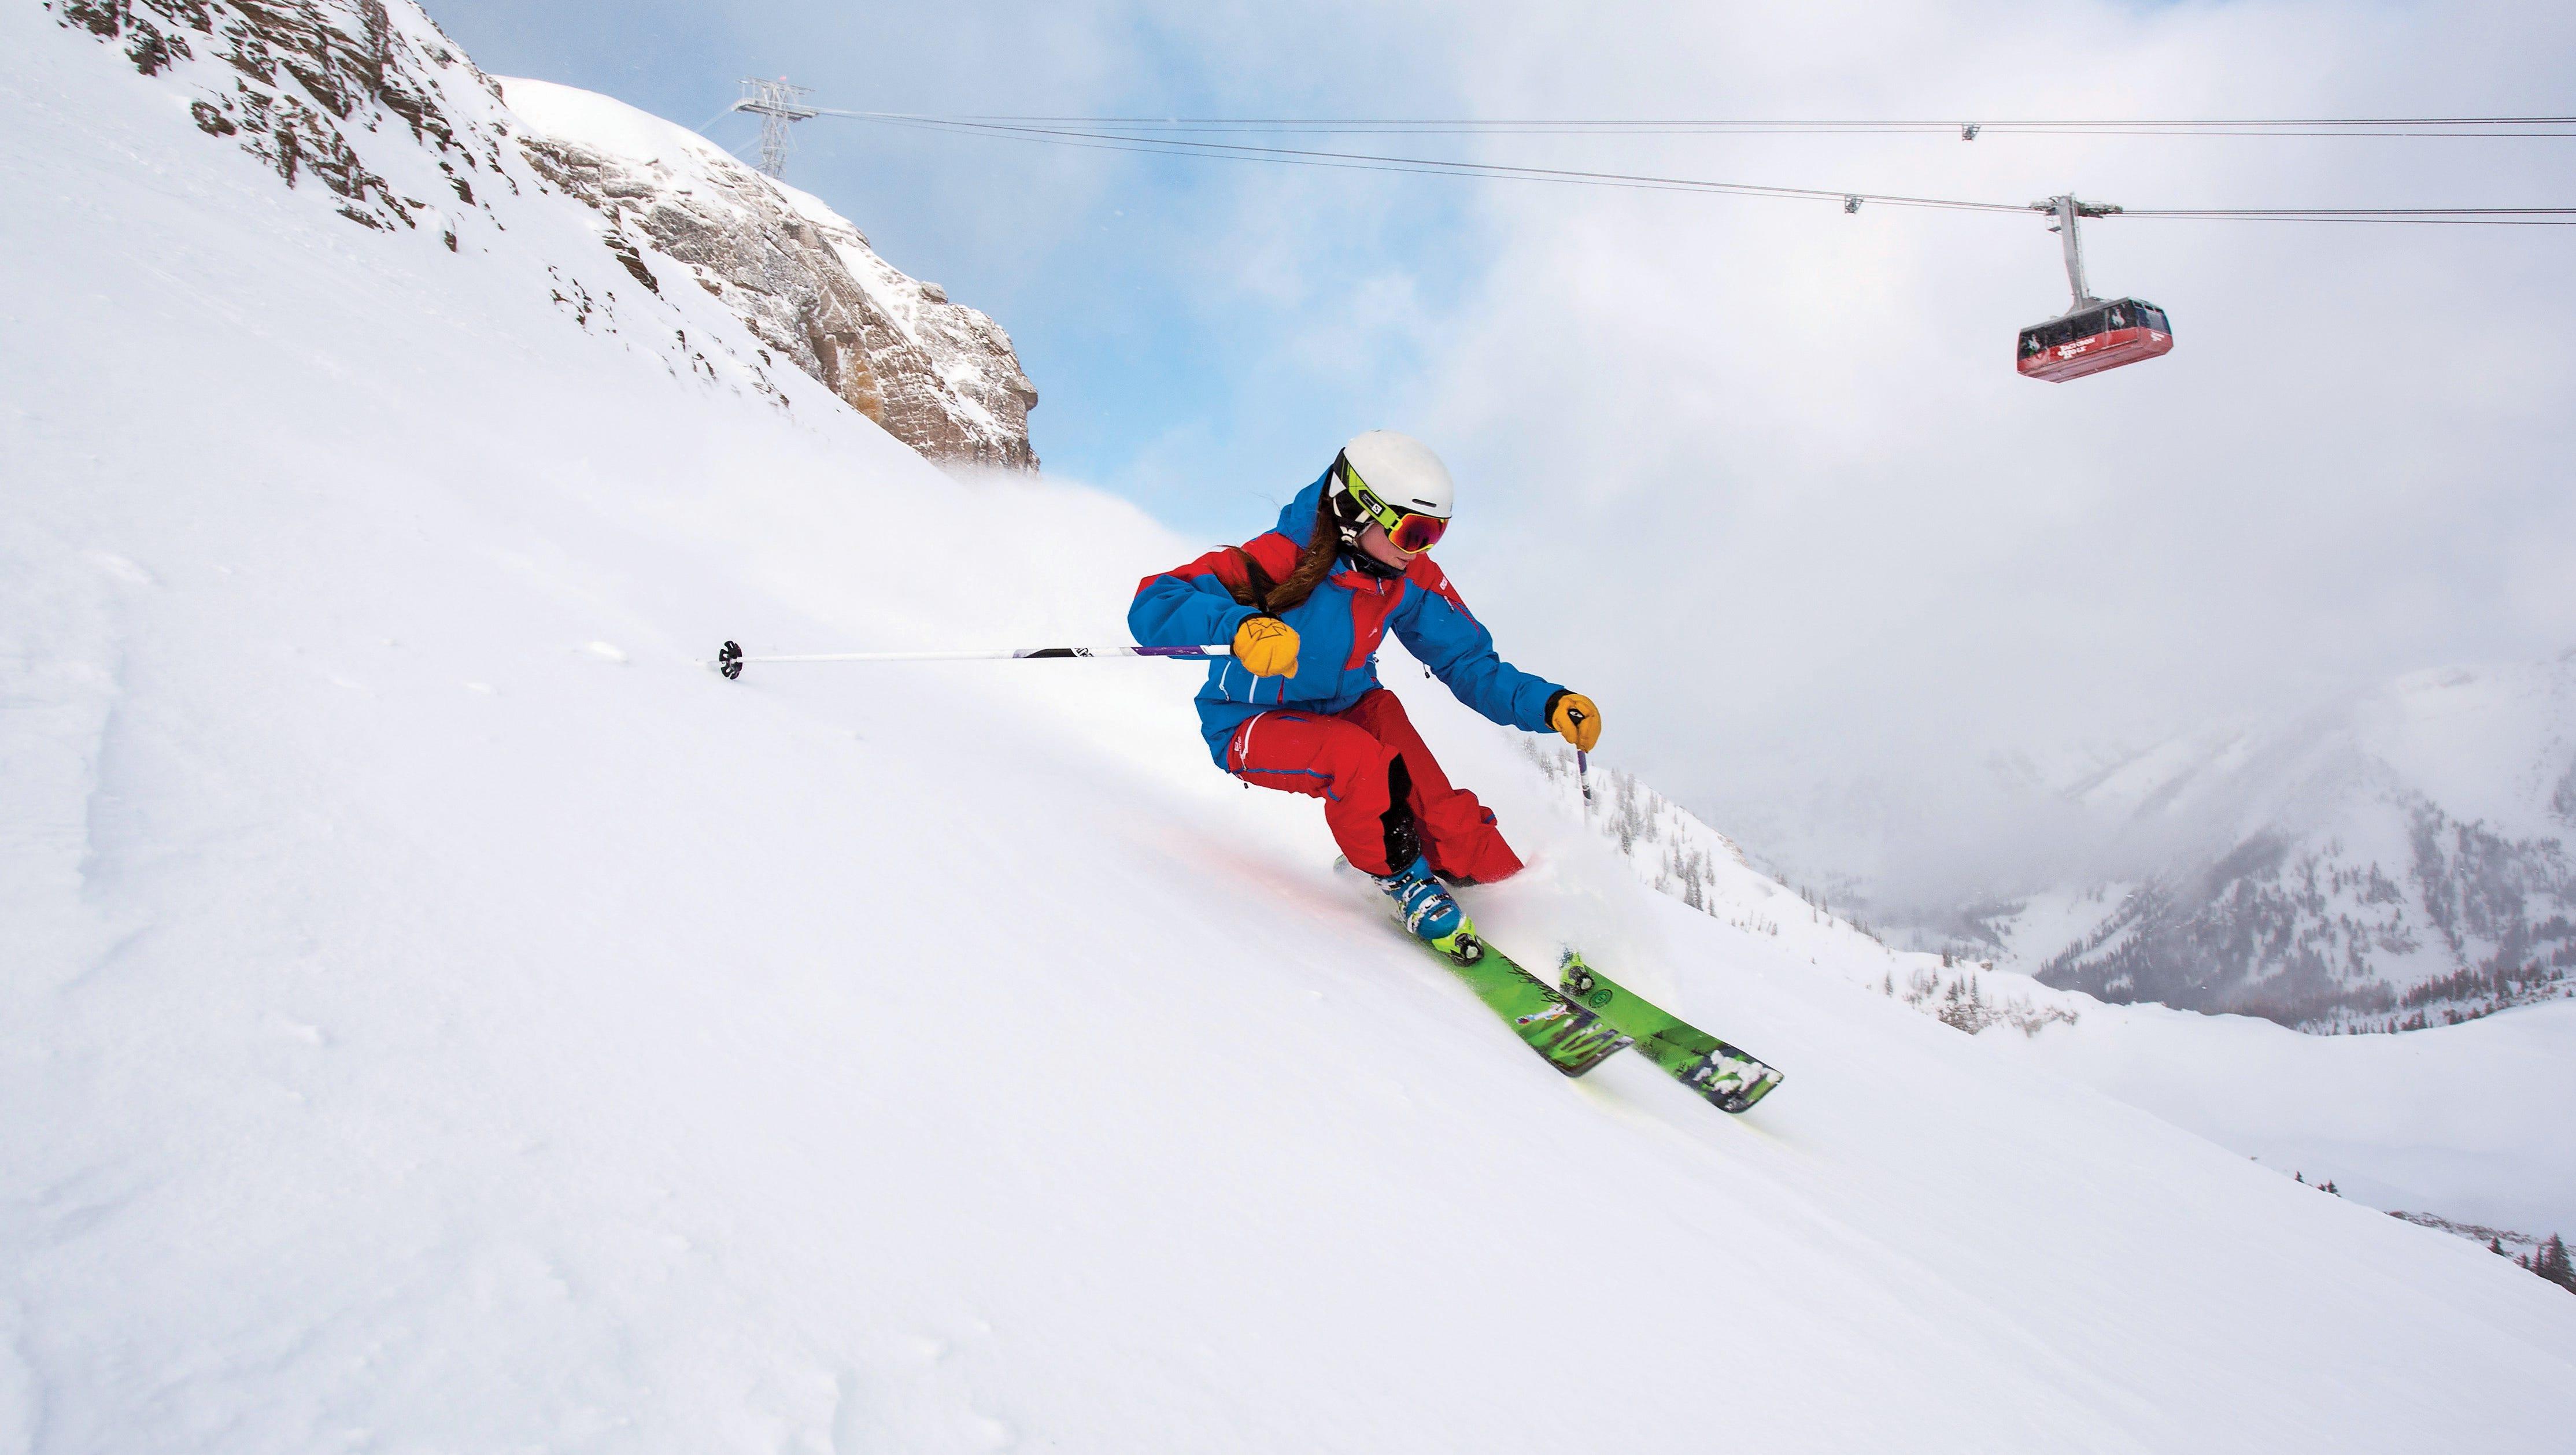 top ski resorts in north america: exclusive rankings